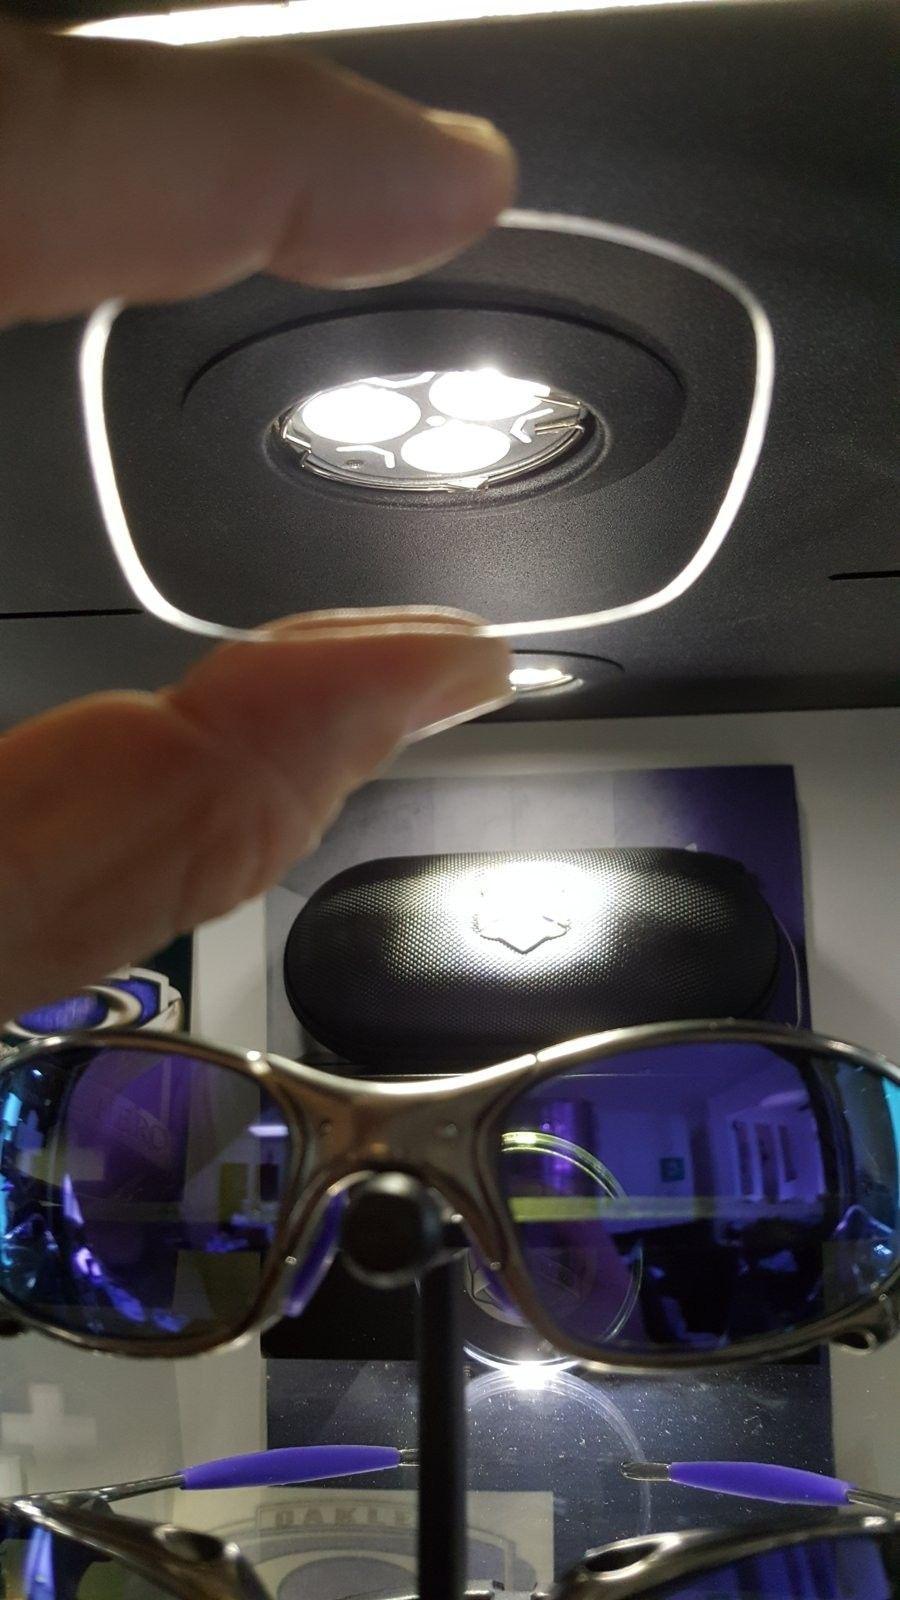 XS photochromic lenses (decided to keep) - 20160527_171930.jpg